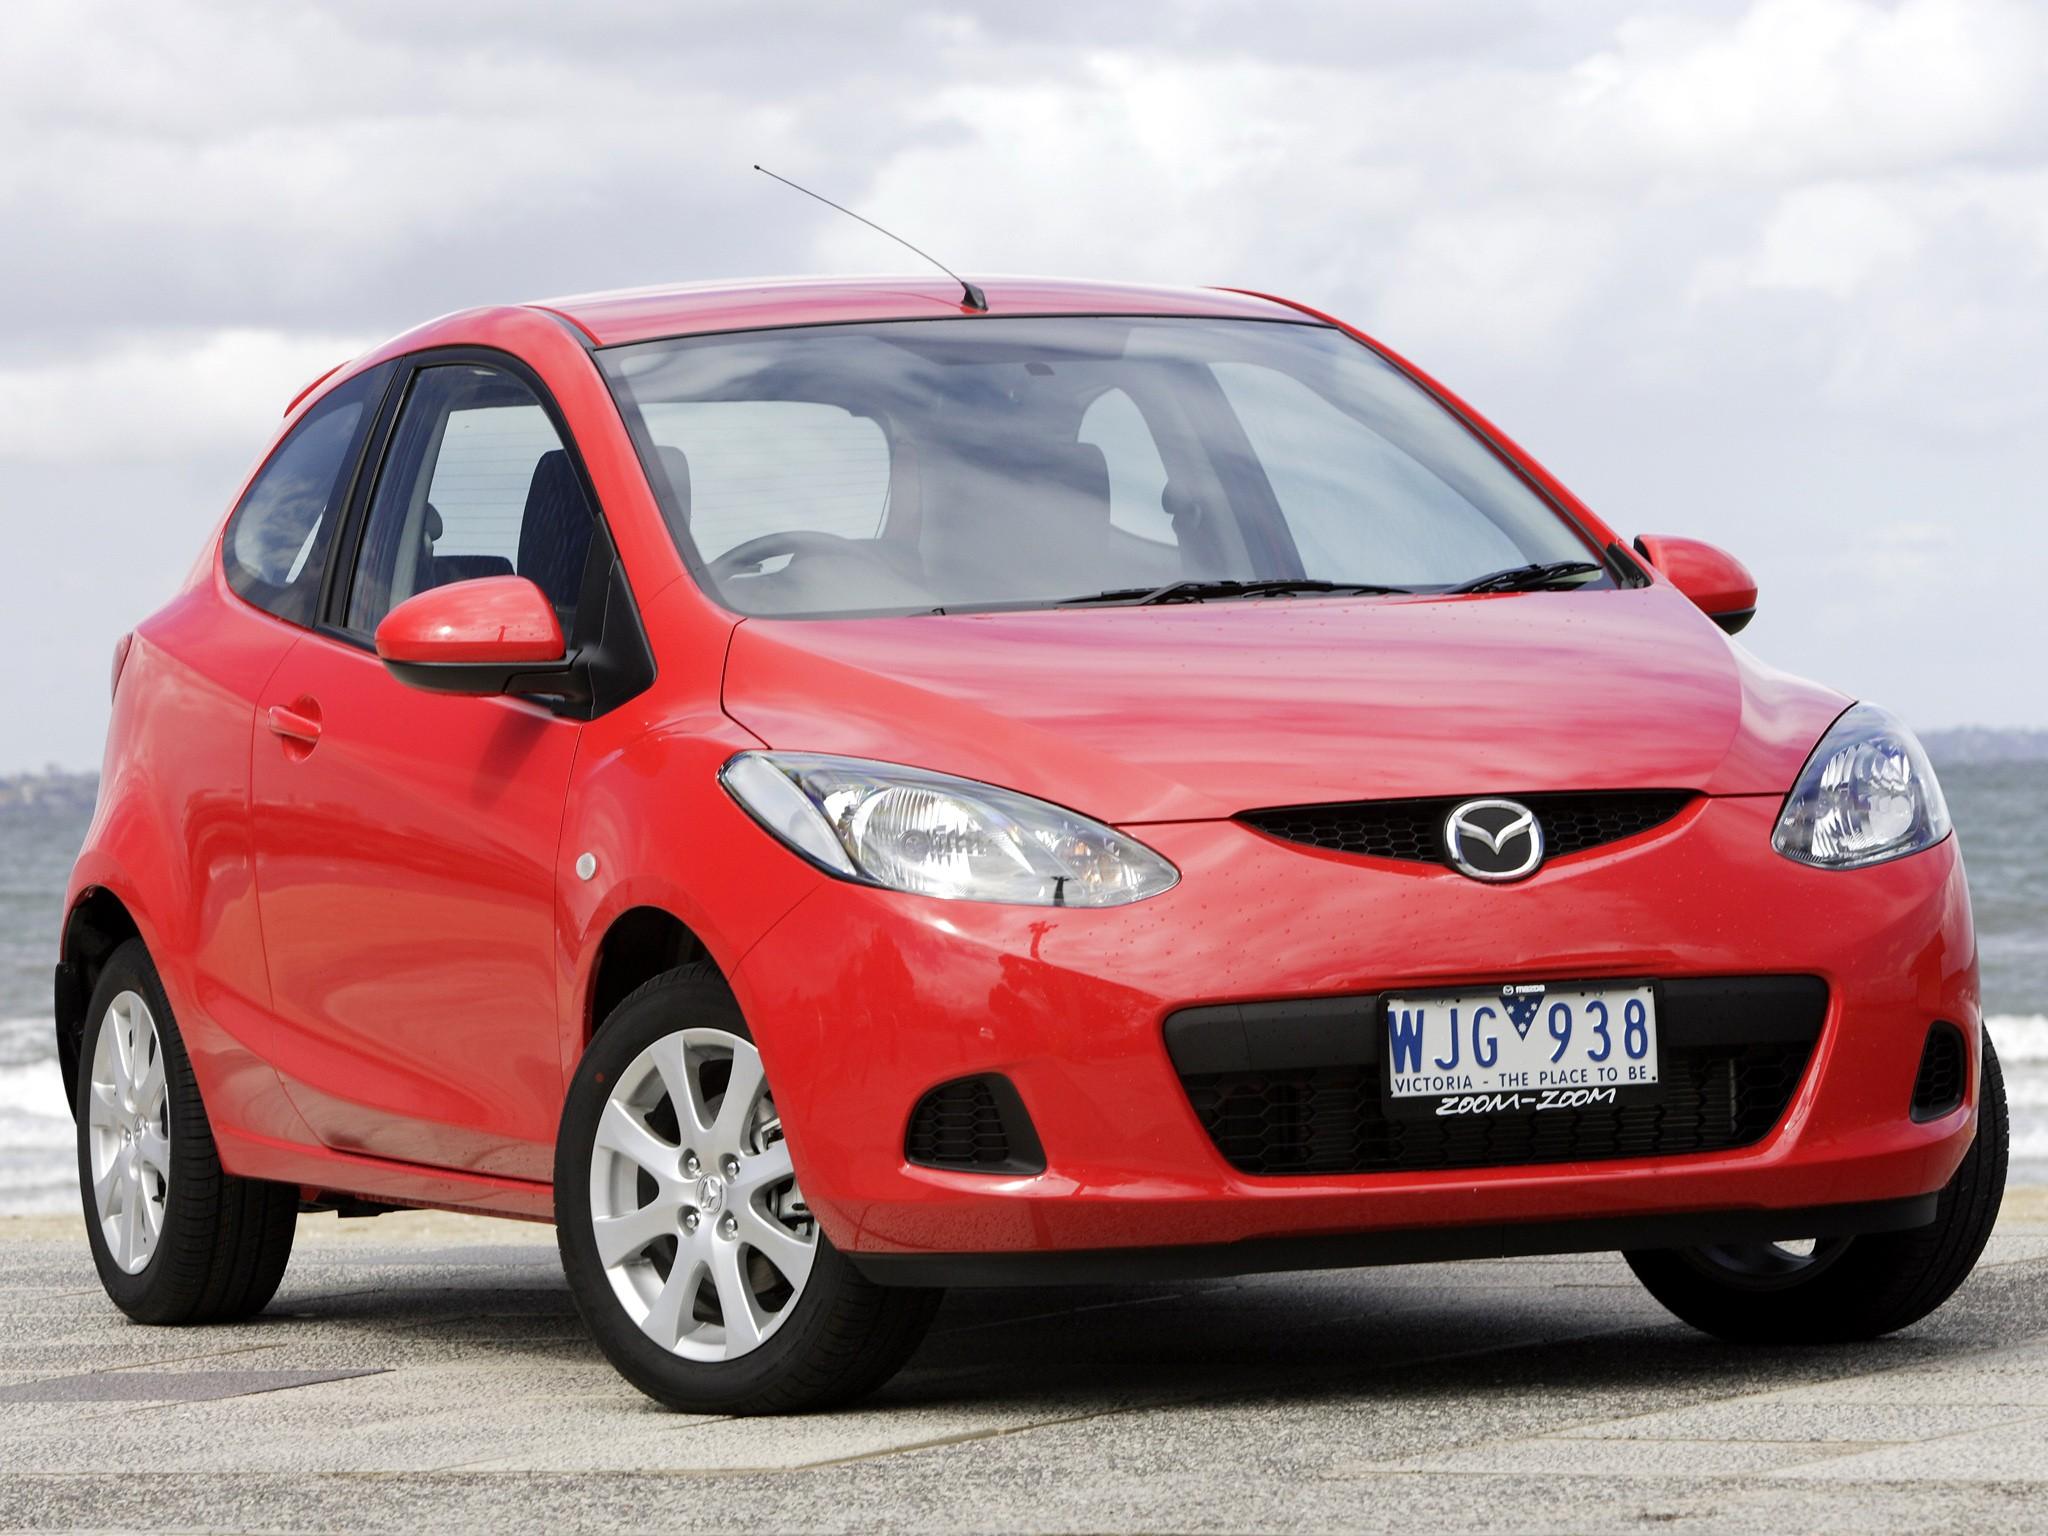 Kelebihan Kekurangan Mazda 2 2010 Murah Berkualitas